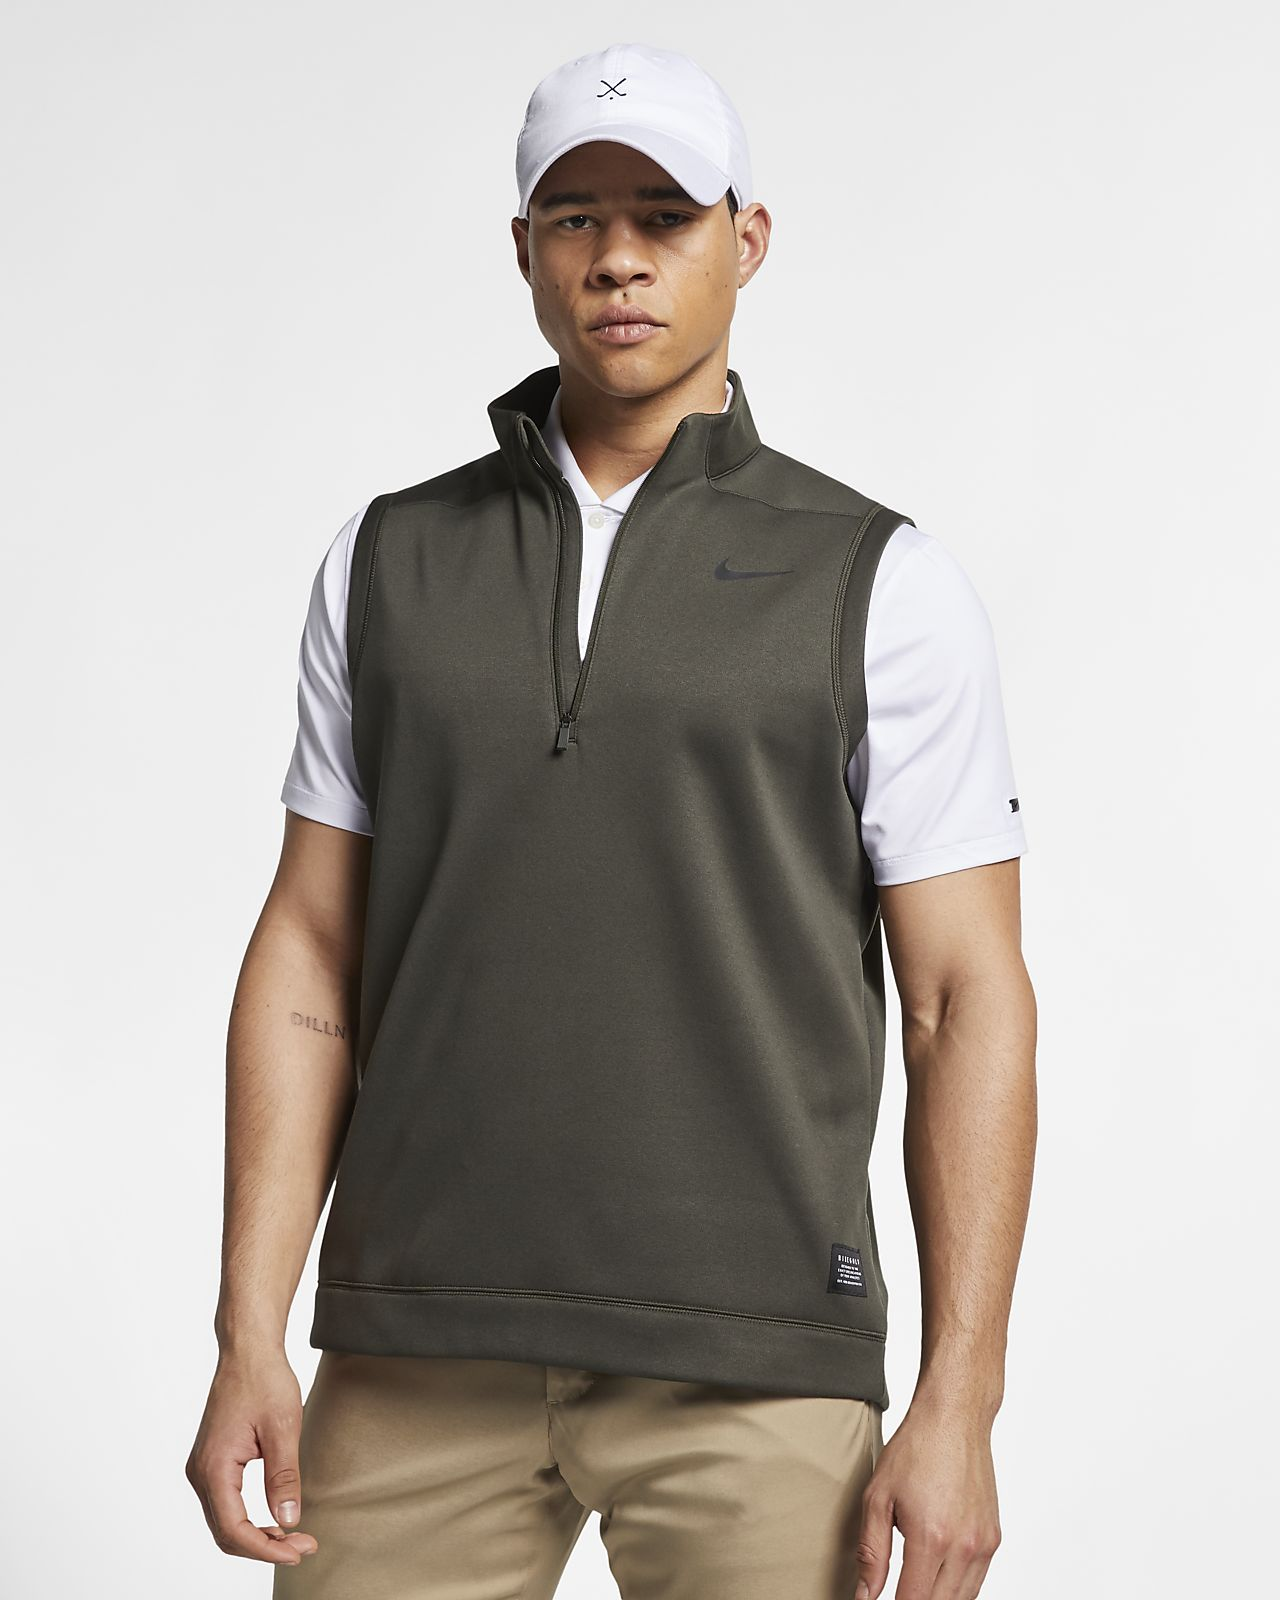 Nike Therma Repel Men's Golf Vest